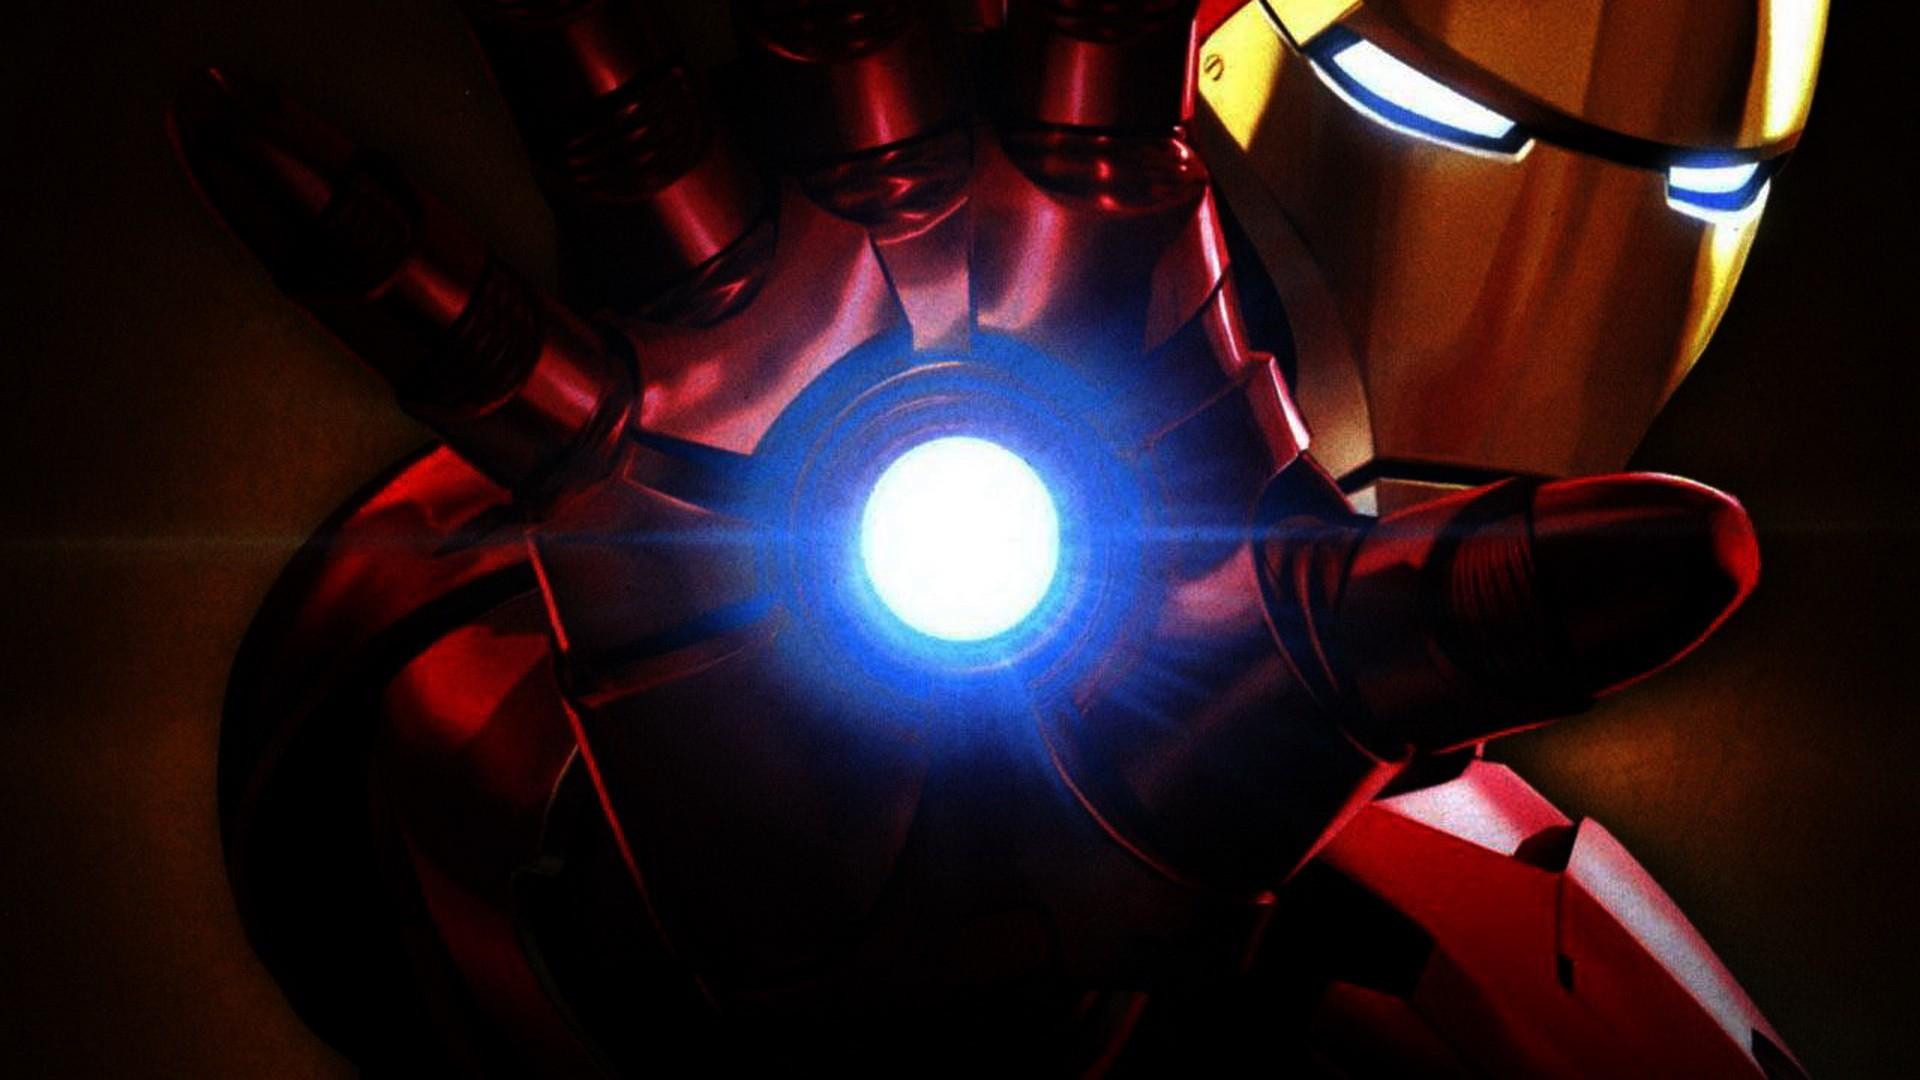 55 Gambar Wallpaper Iron Man Gratis Terbaru